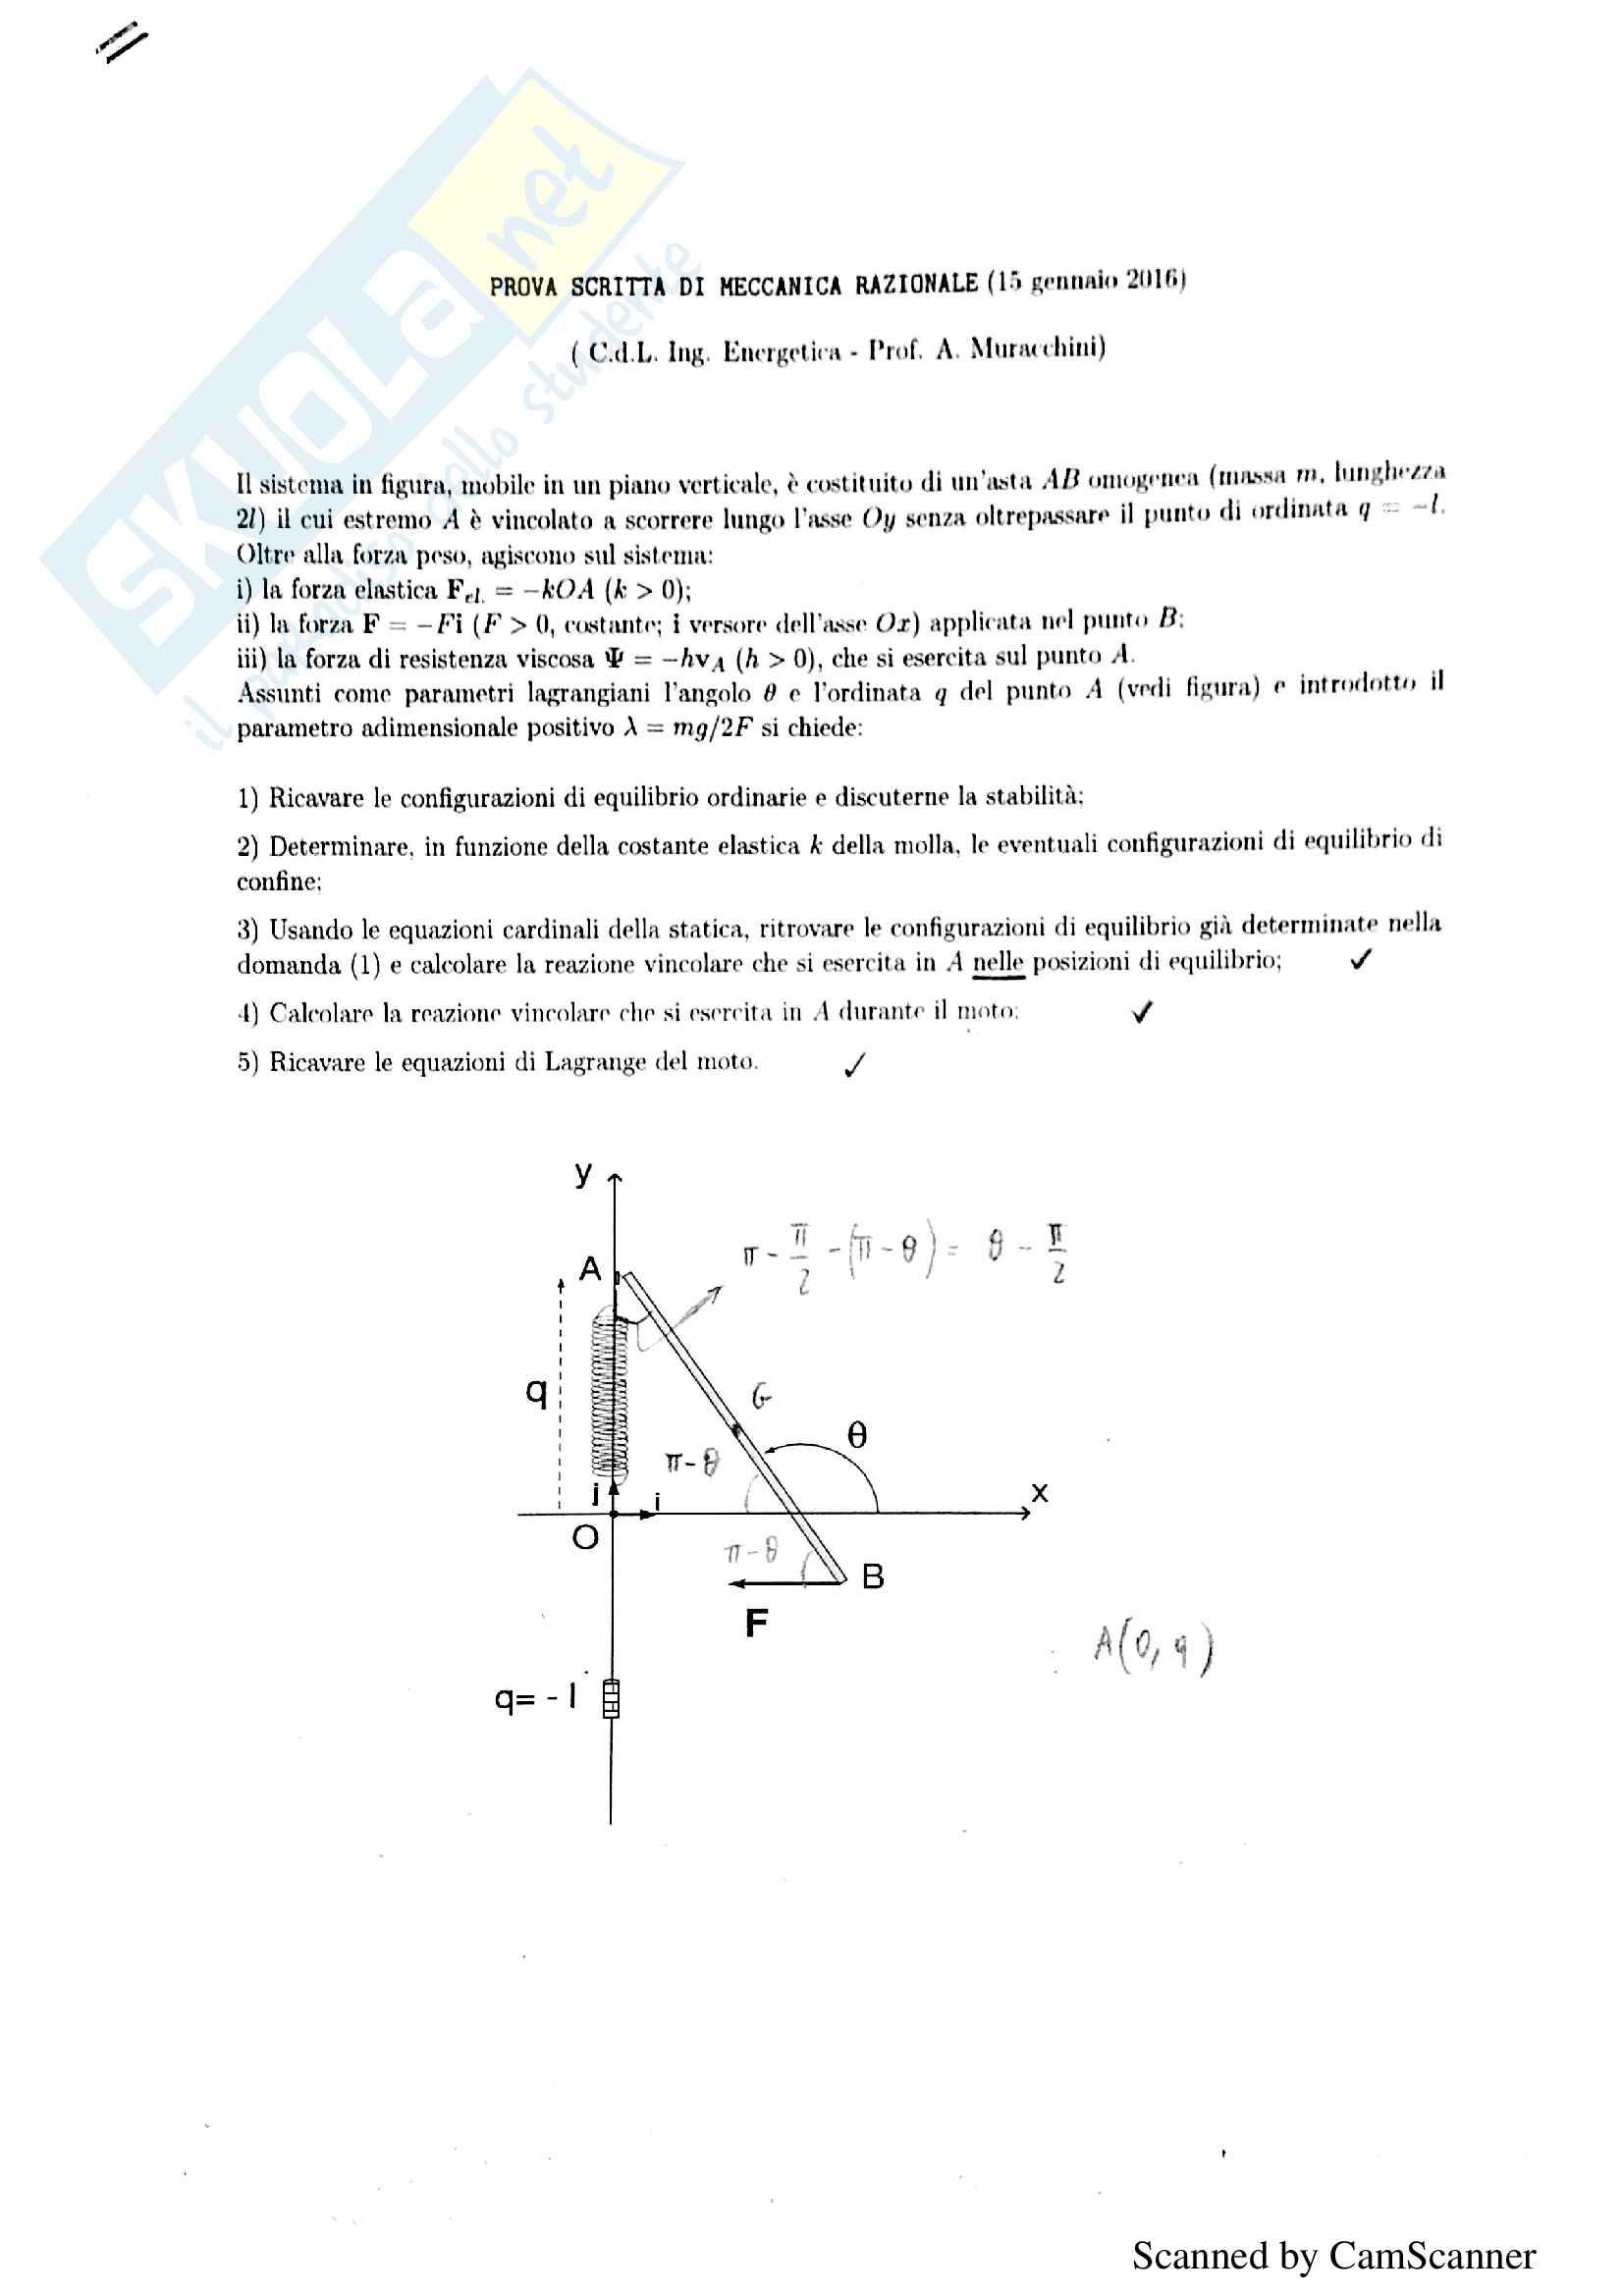 Risoluzione prove scritte 2016, meccanica razionale, prof. Muracchini